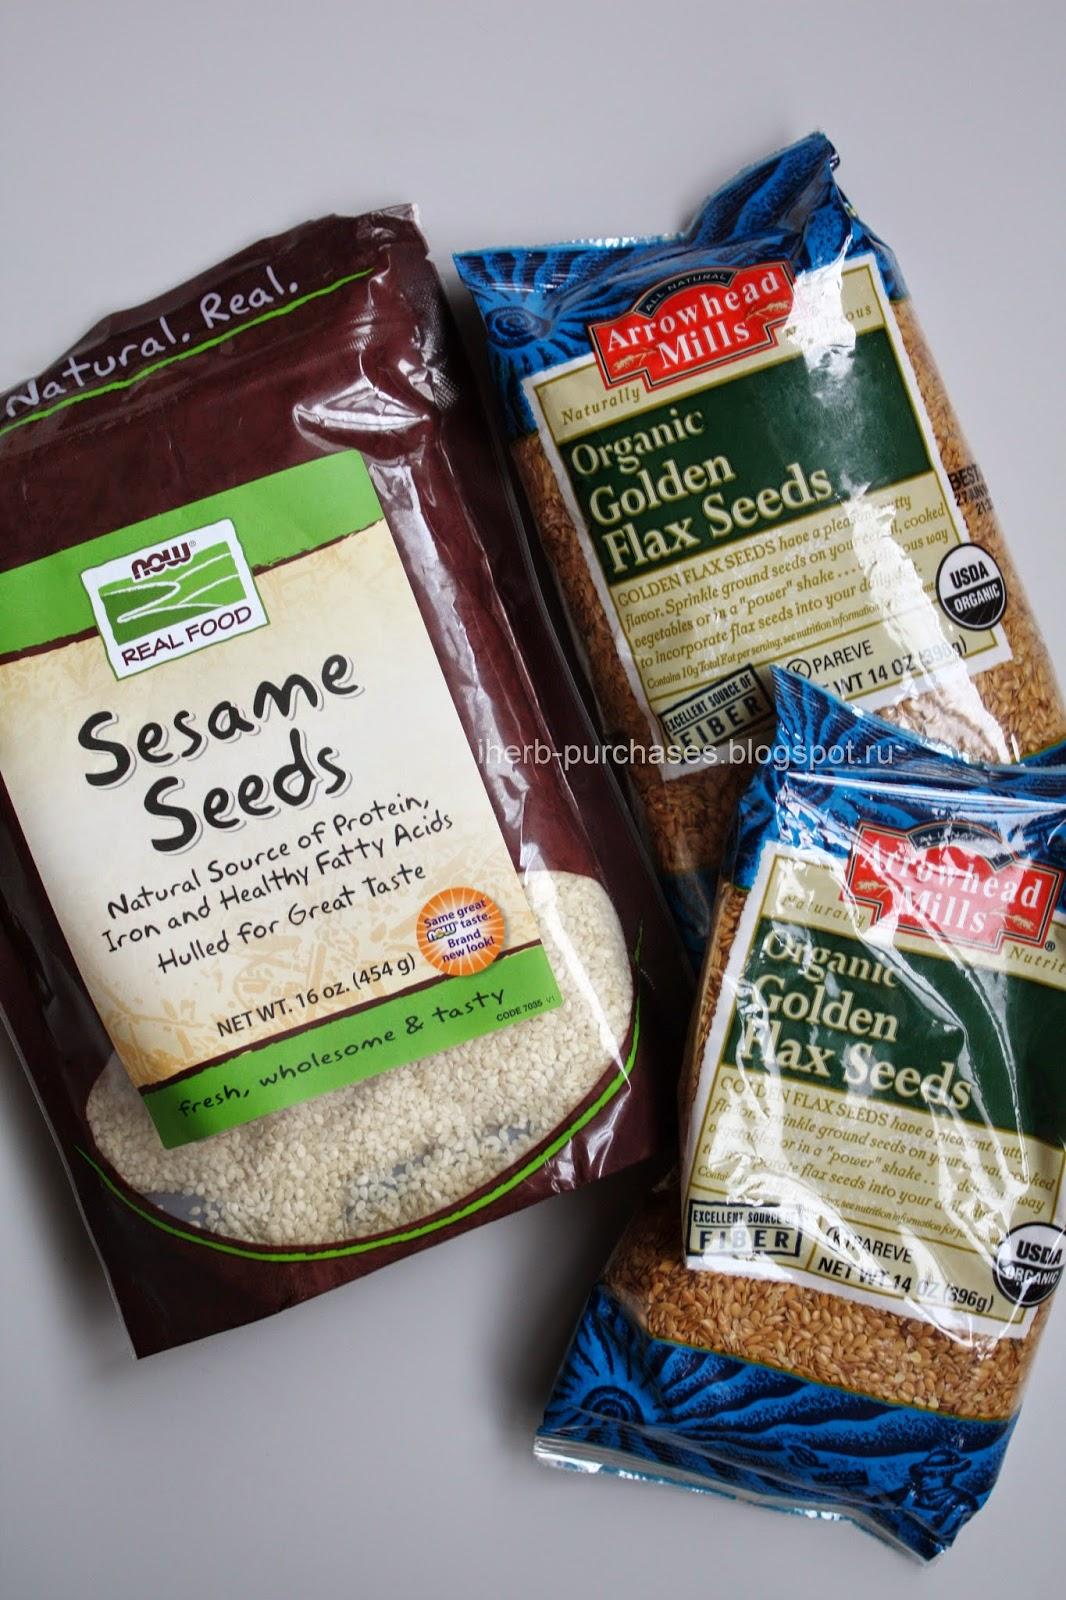 Arrowhead Mills, Organic Golden Flax Seeds, 14 oz (396 g) + Now Foods, Real Food, Sesame Seeds, 16 oz (454 g)